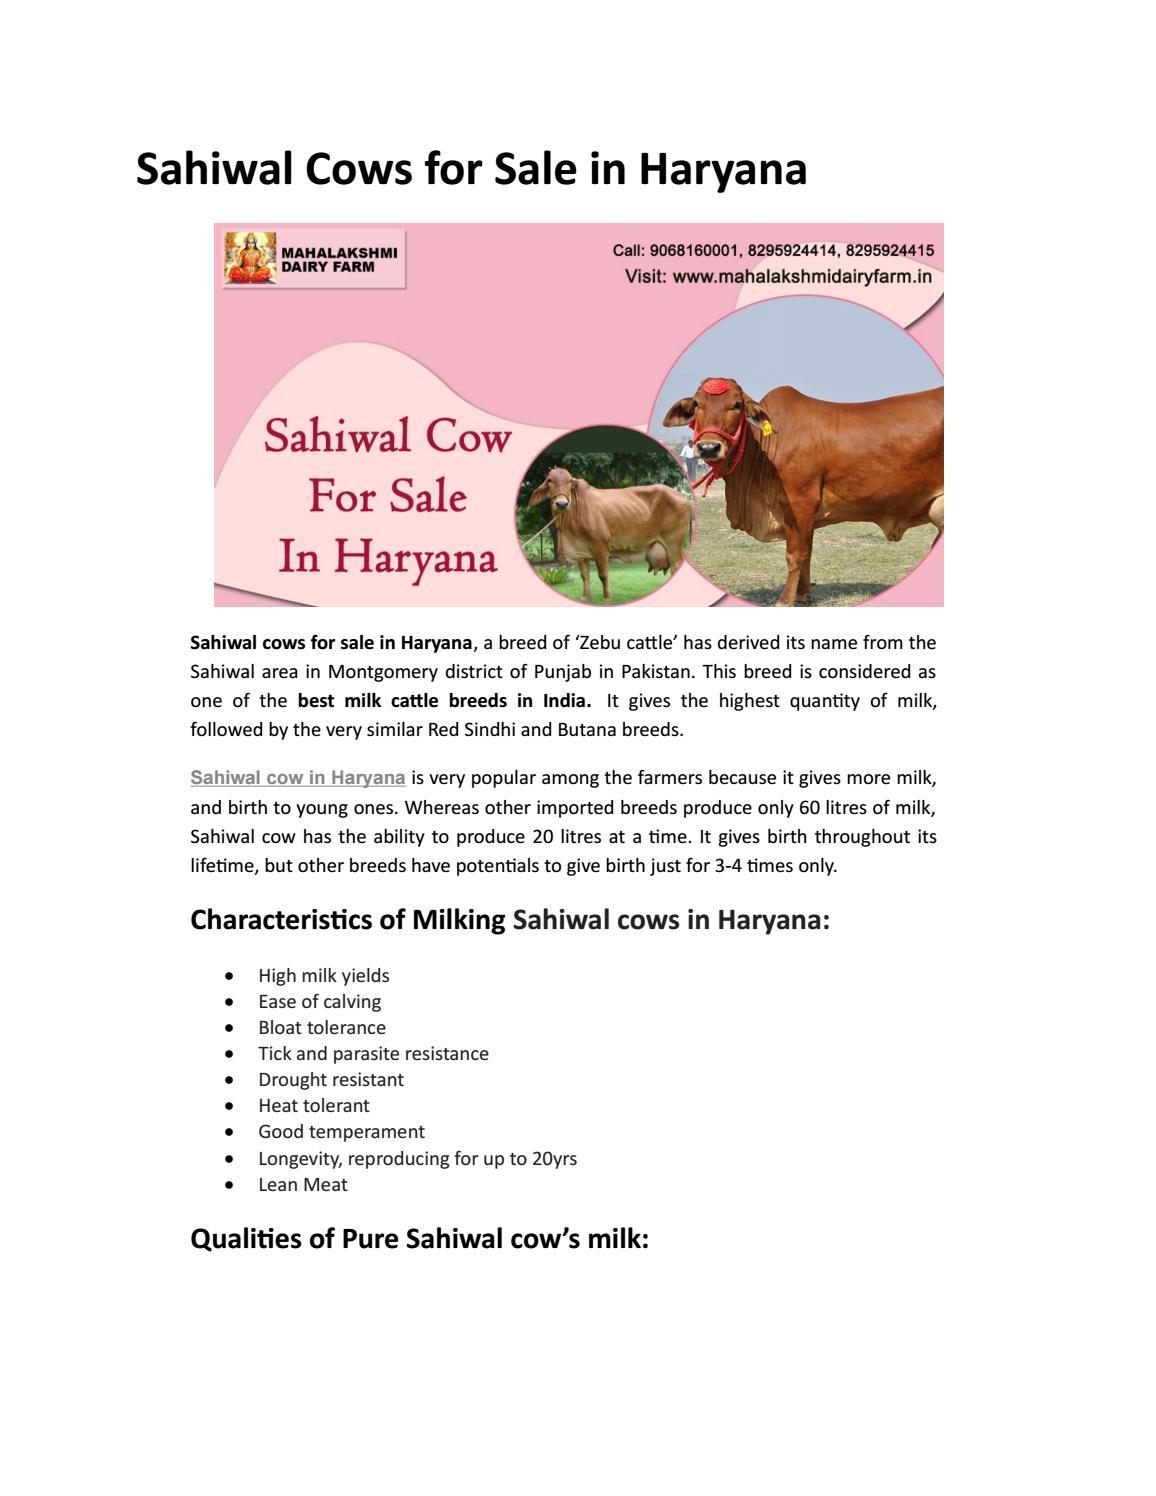 Sahiwal Cow For Sale in Haryana by Mahalakshmi Dairy Farm